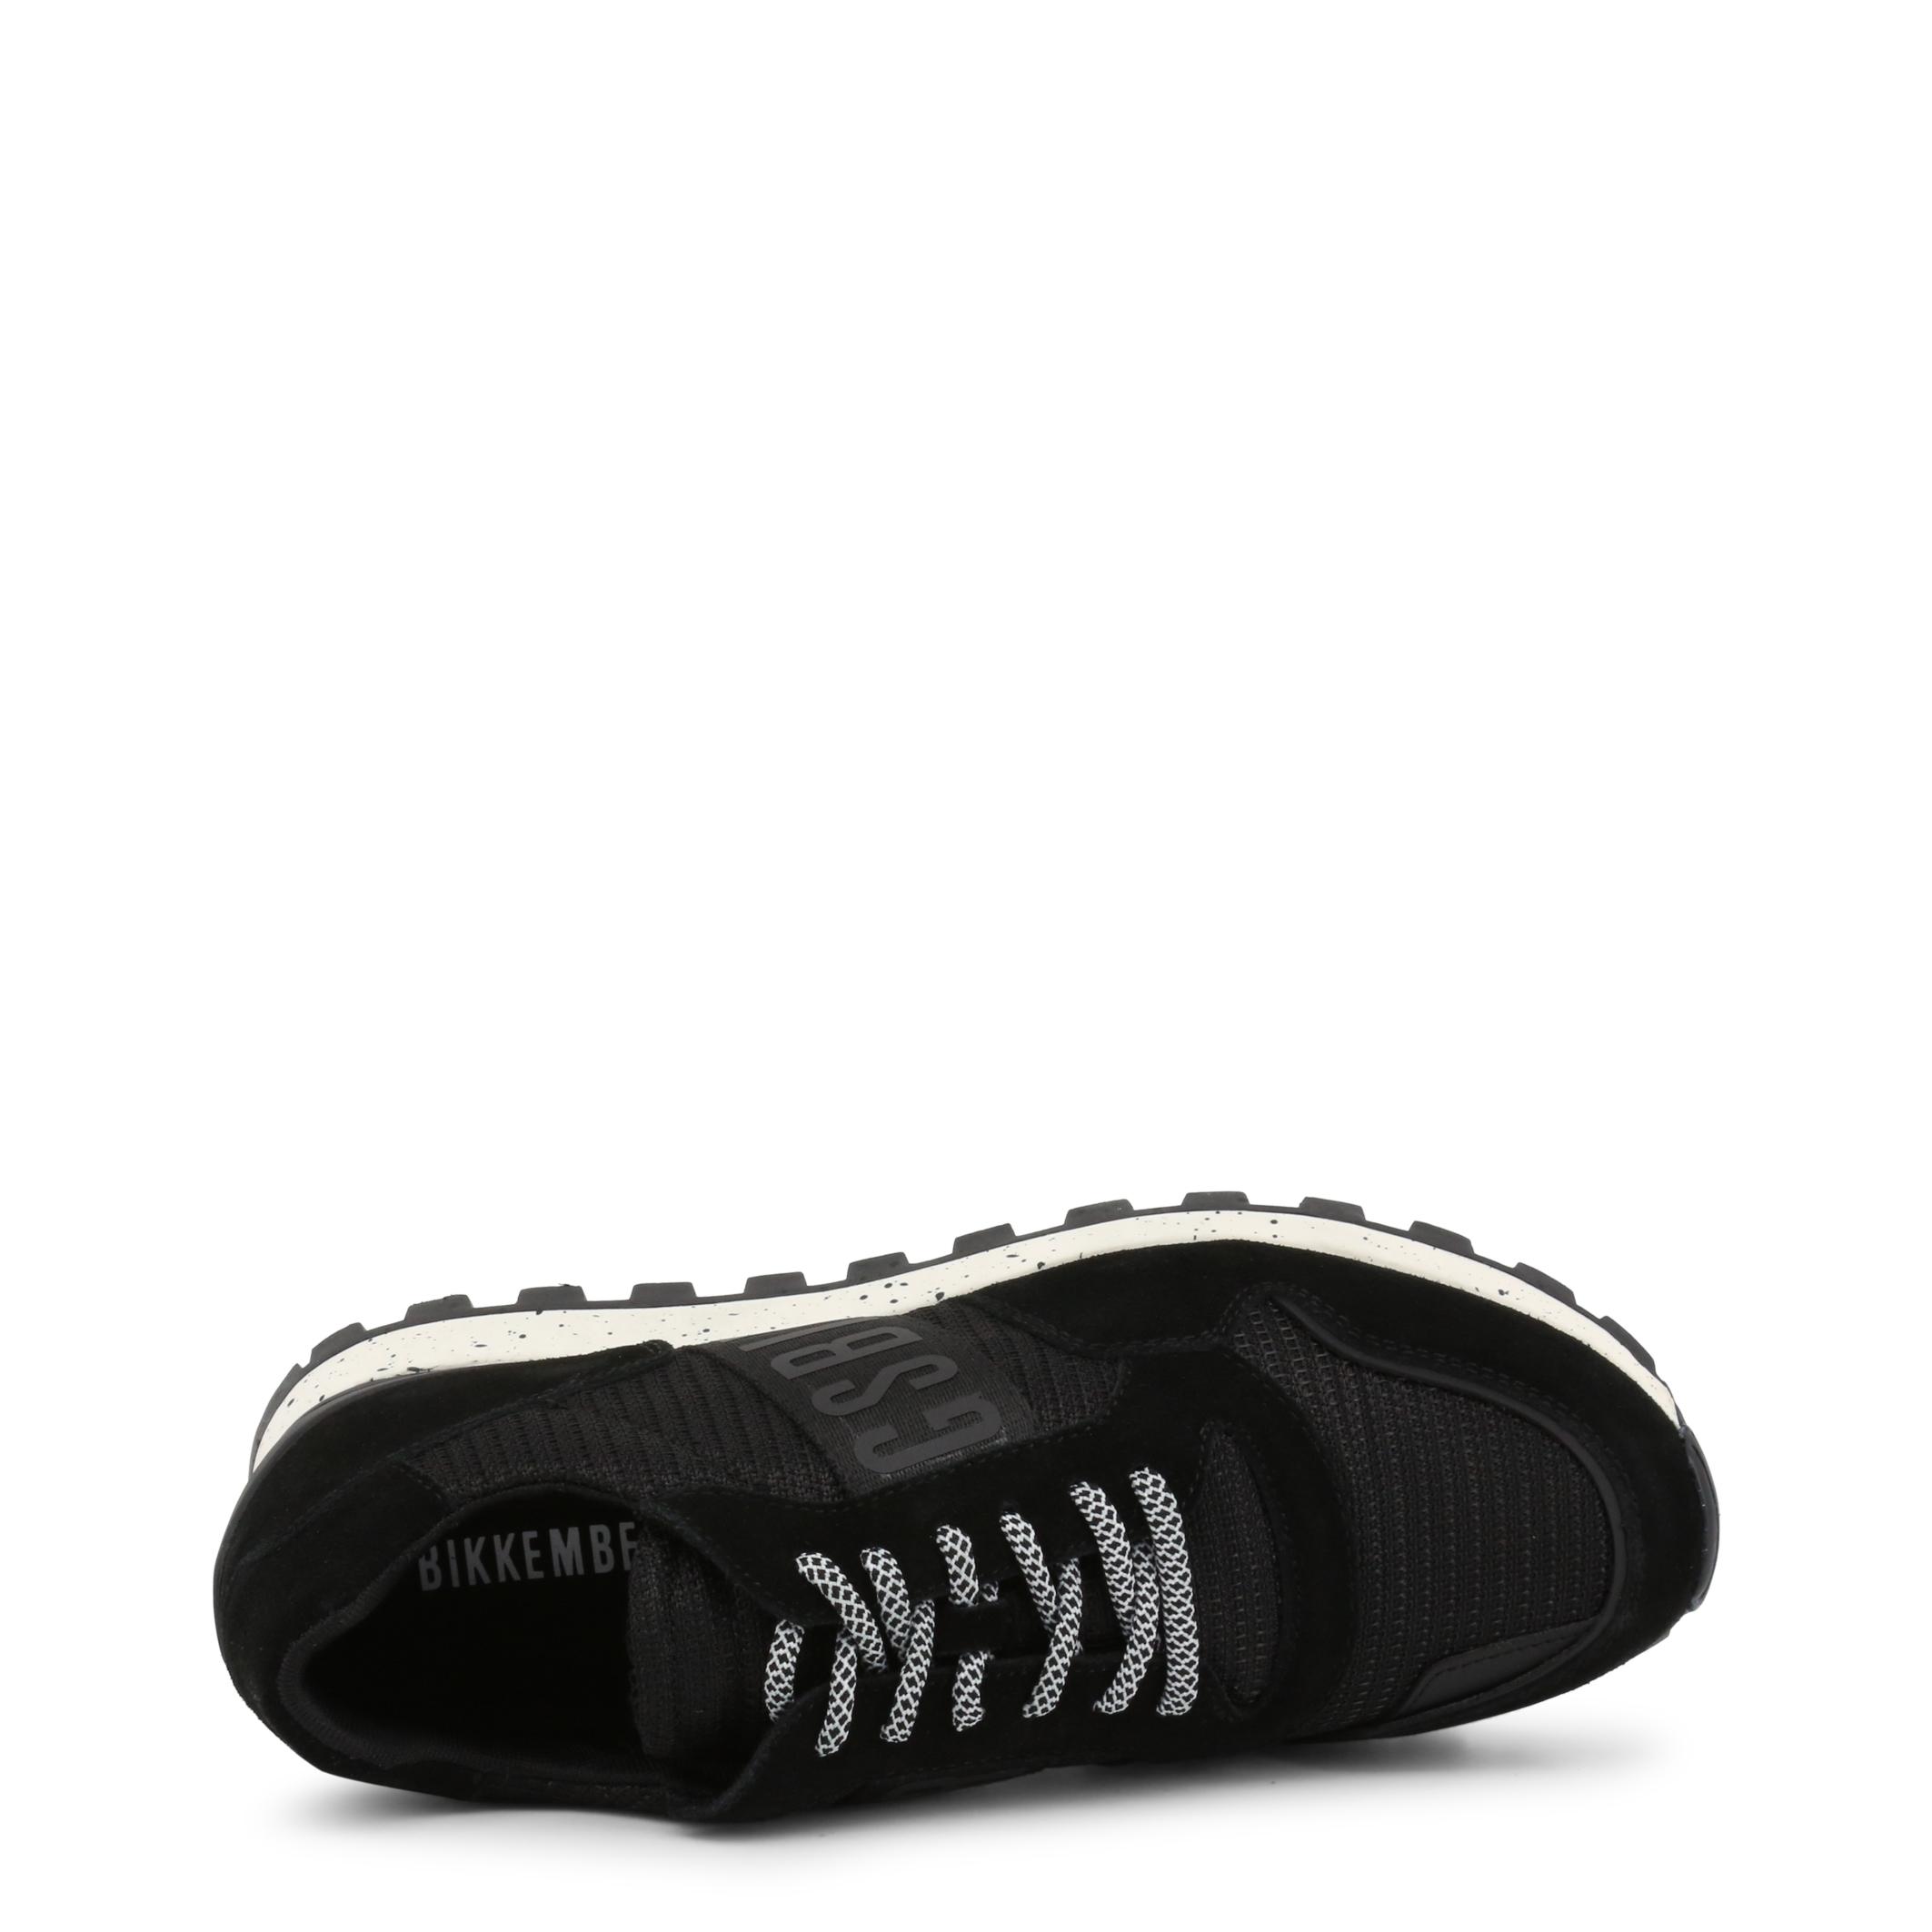 Sneakers-Bikkembergs-FEND-ER-2356-Uomo-Nero-101355 miniatura 3